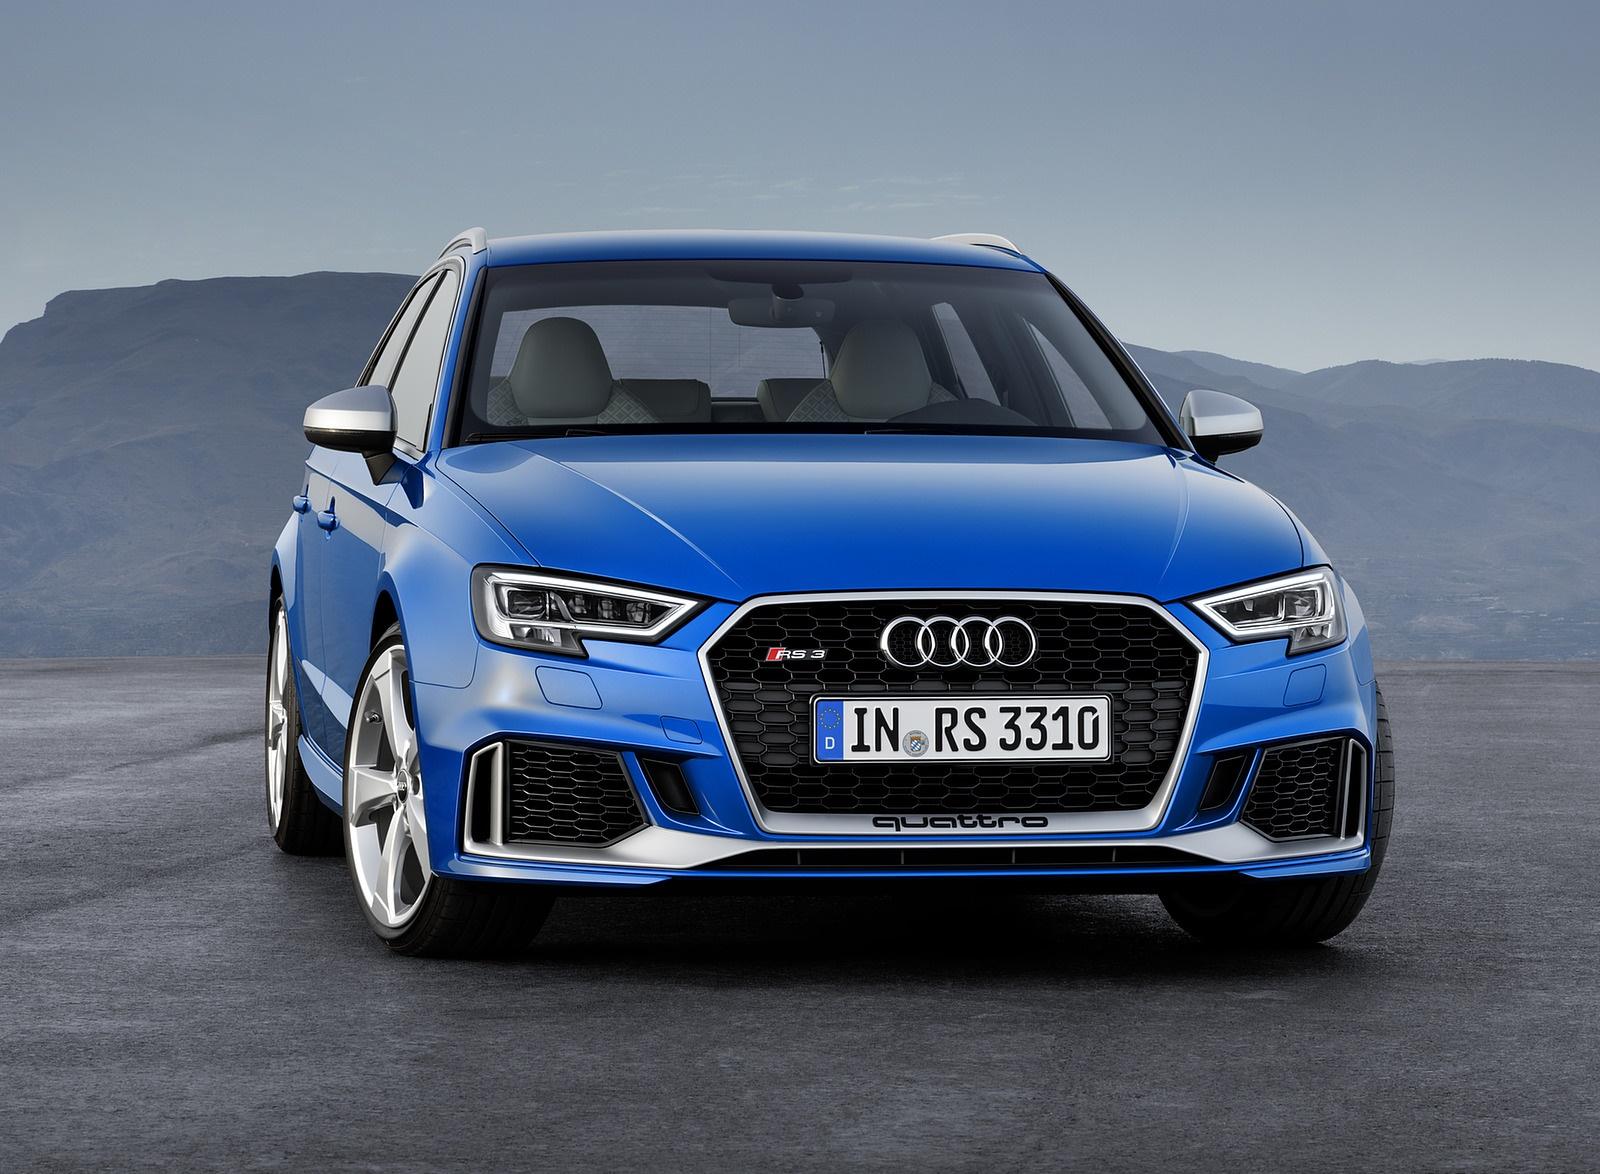 2018 Audi RS 3 Sportback (Color: Ara Blue) Front Wallpaper (7)